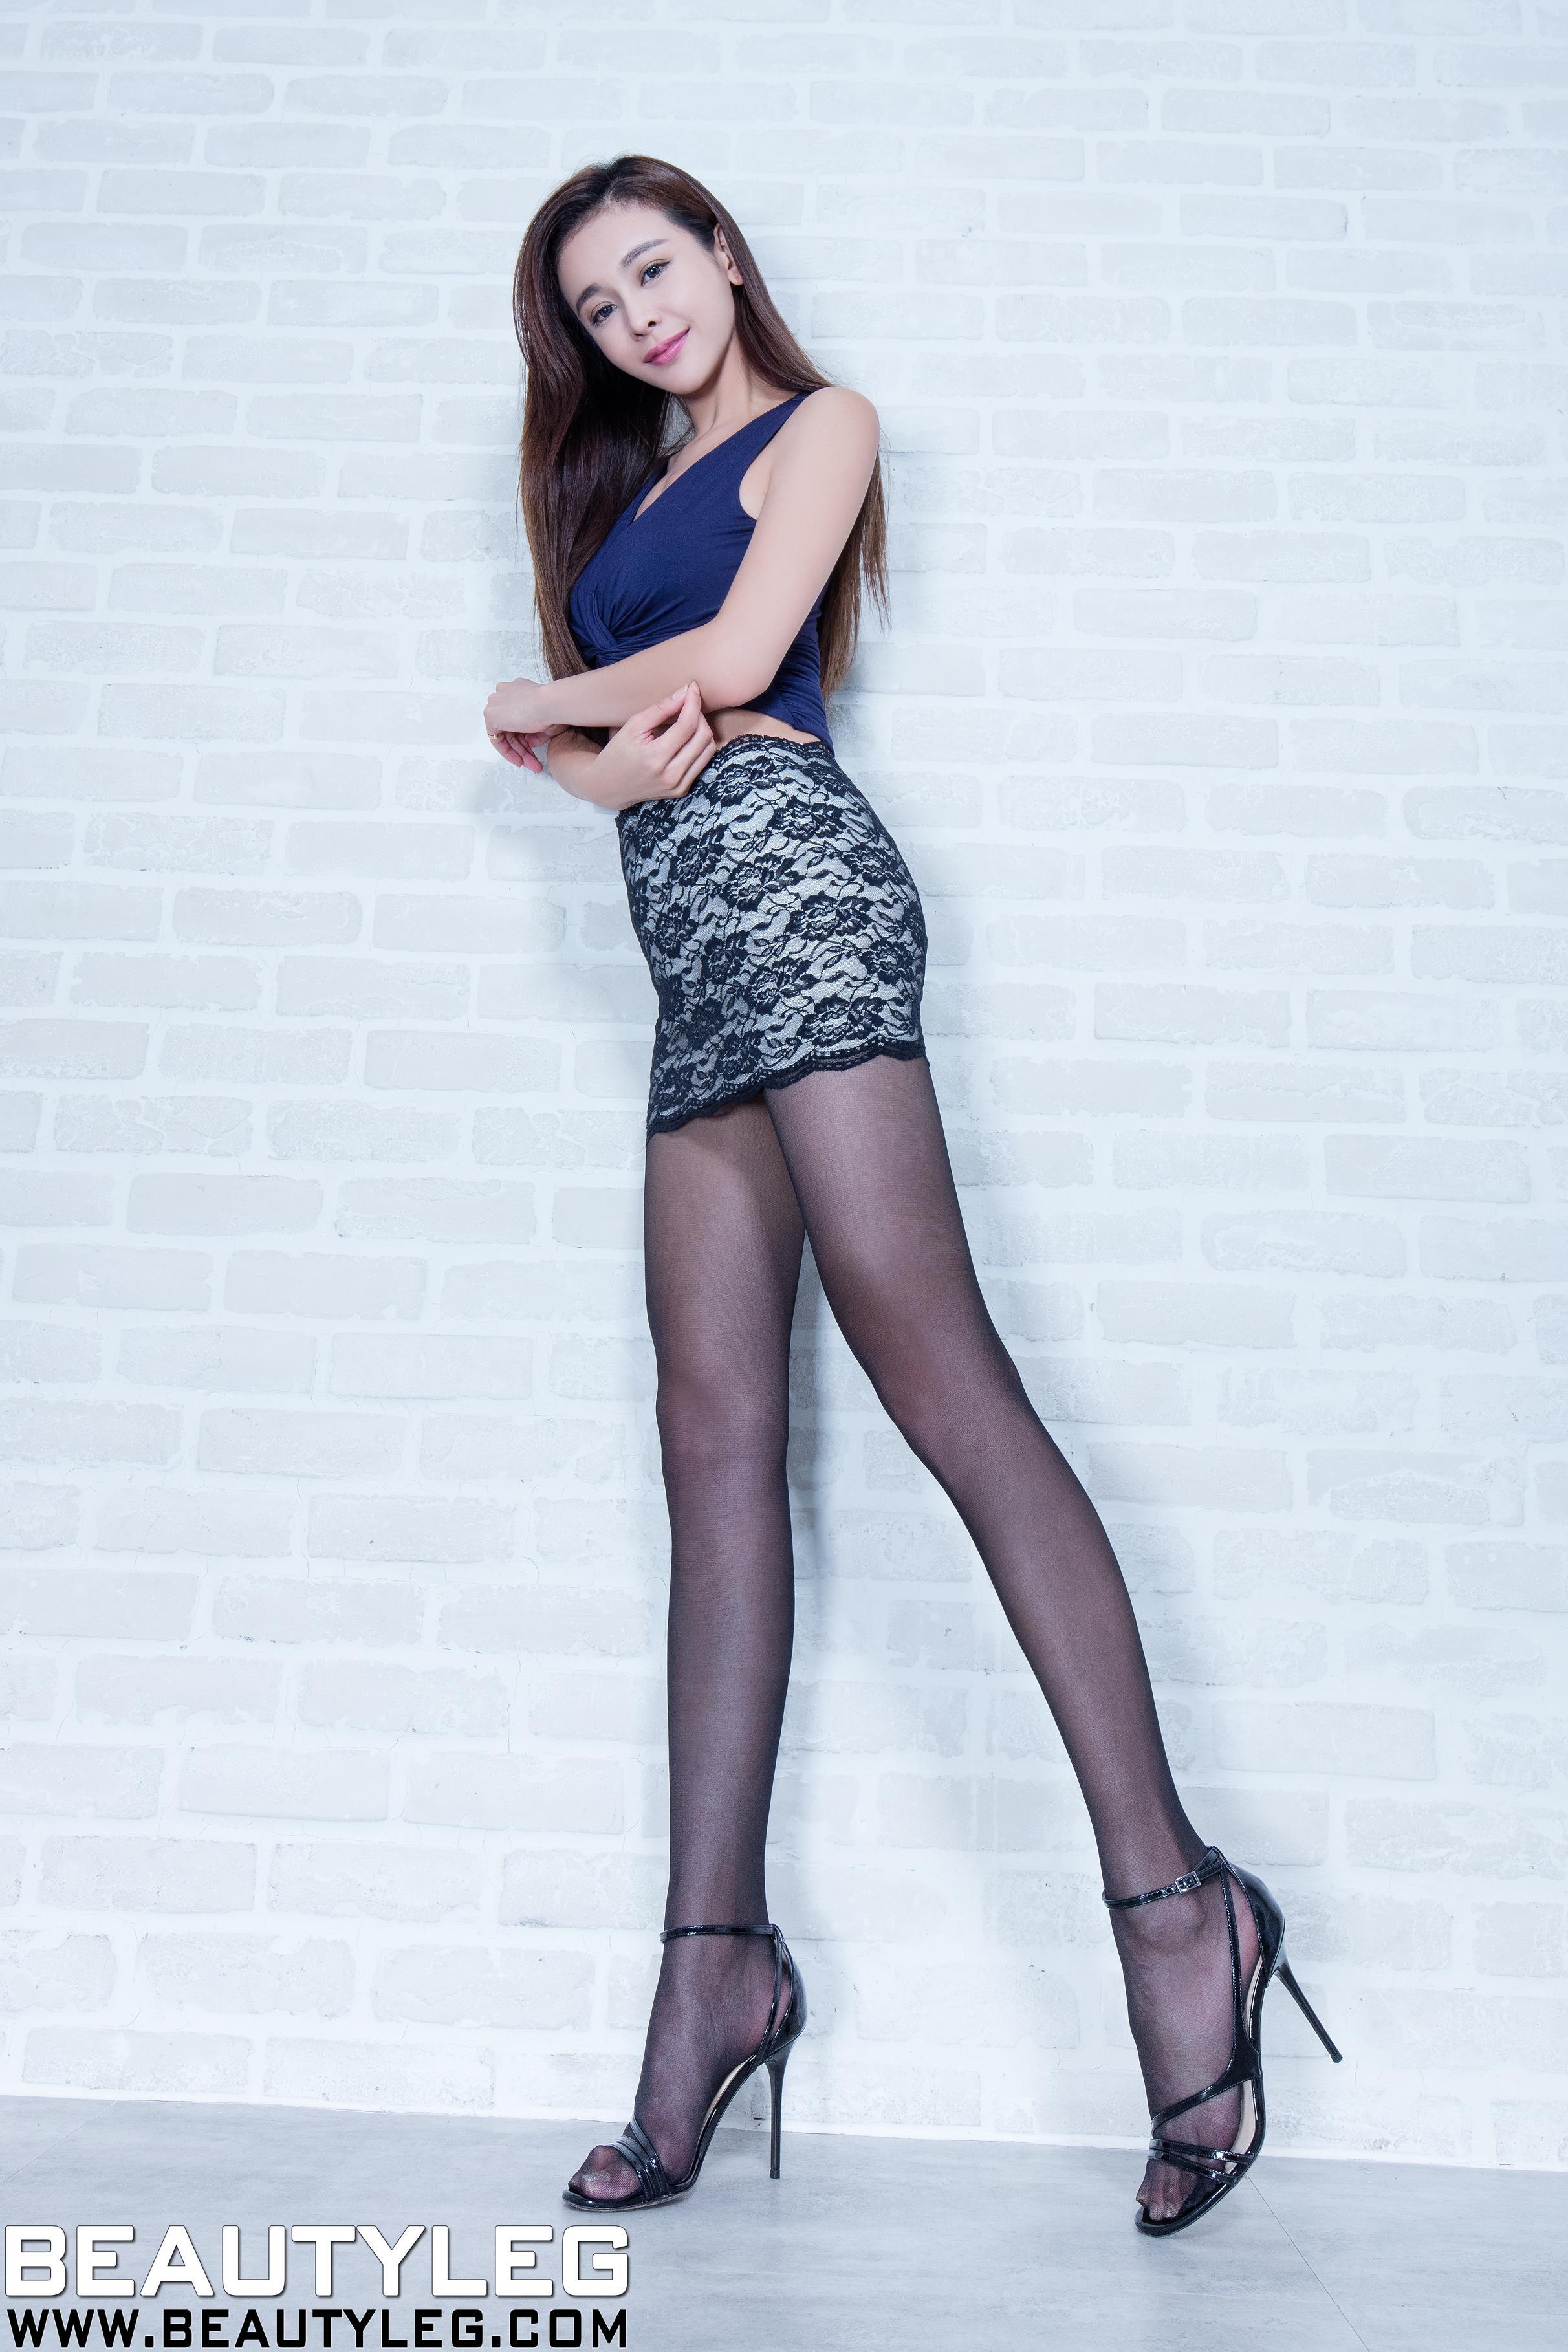 [Beautyleg美腿写真]No.1564 黑色短裙美女 Dennise 黑色丝袜美腿性感私房写真集